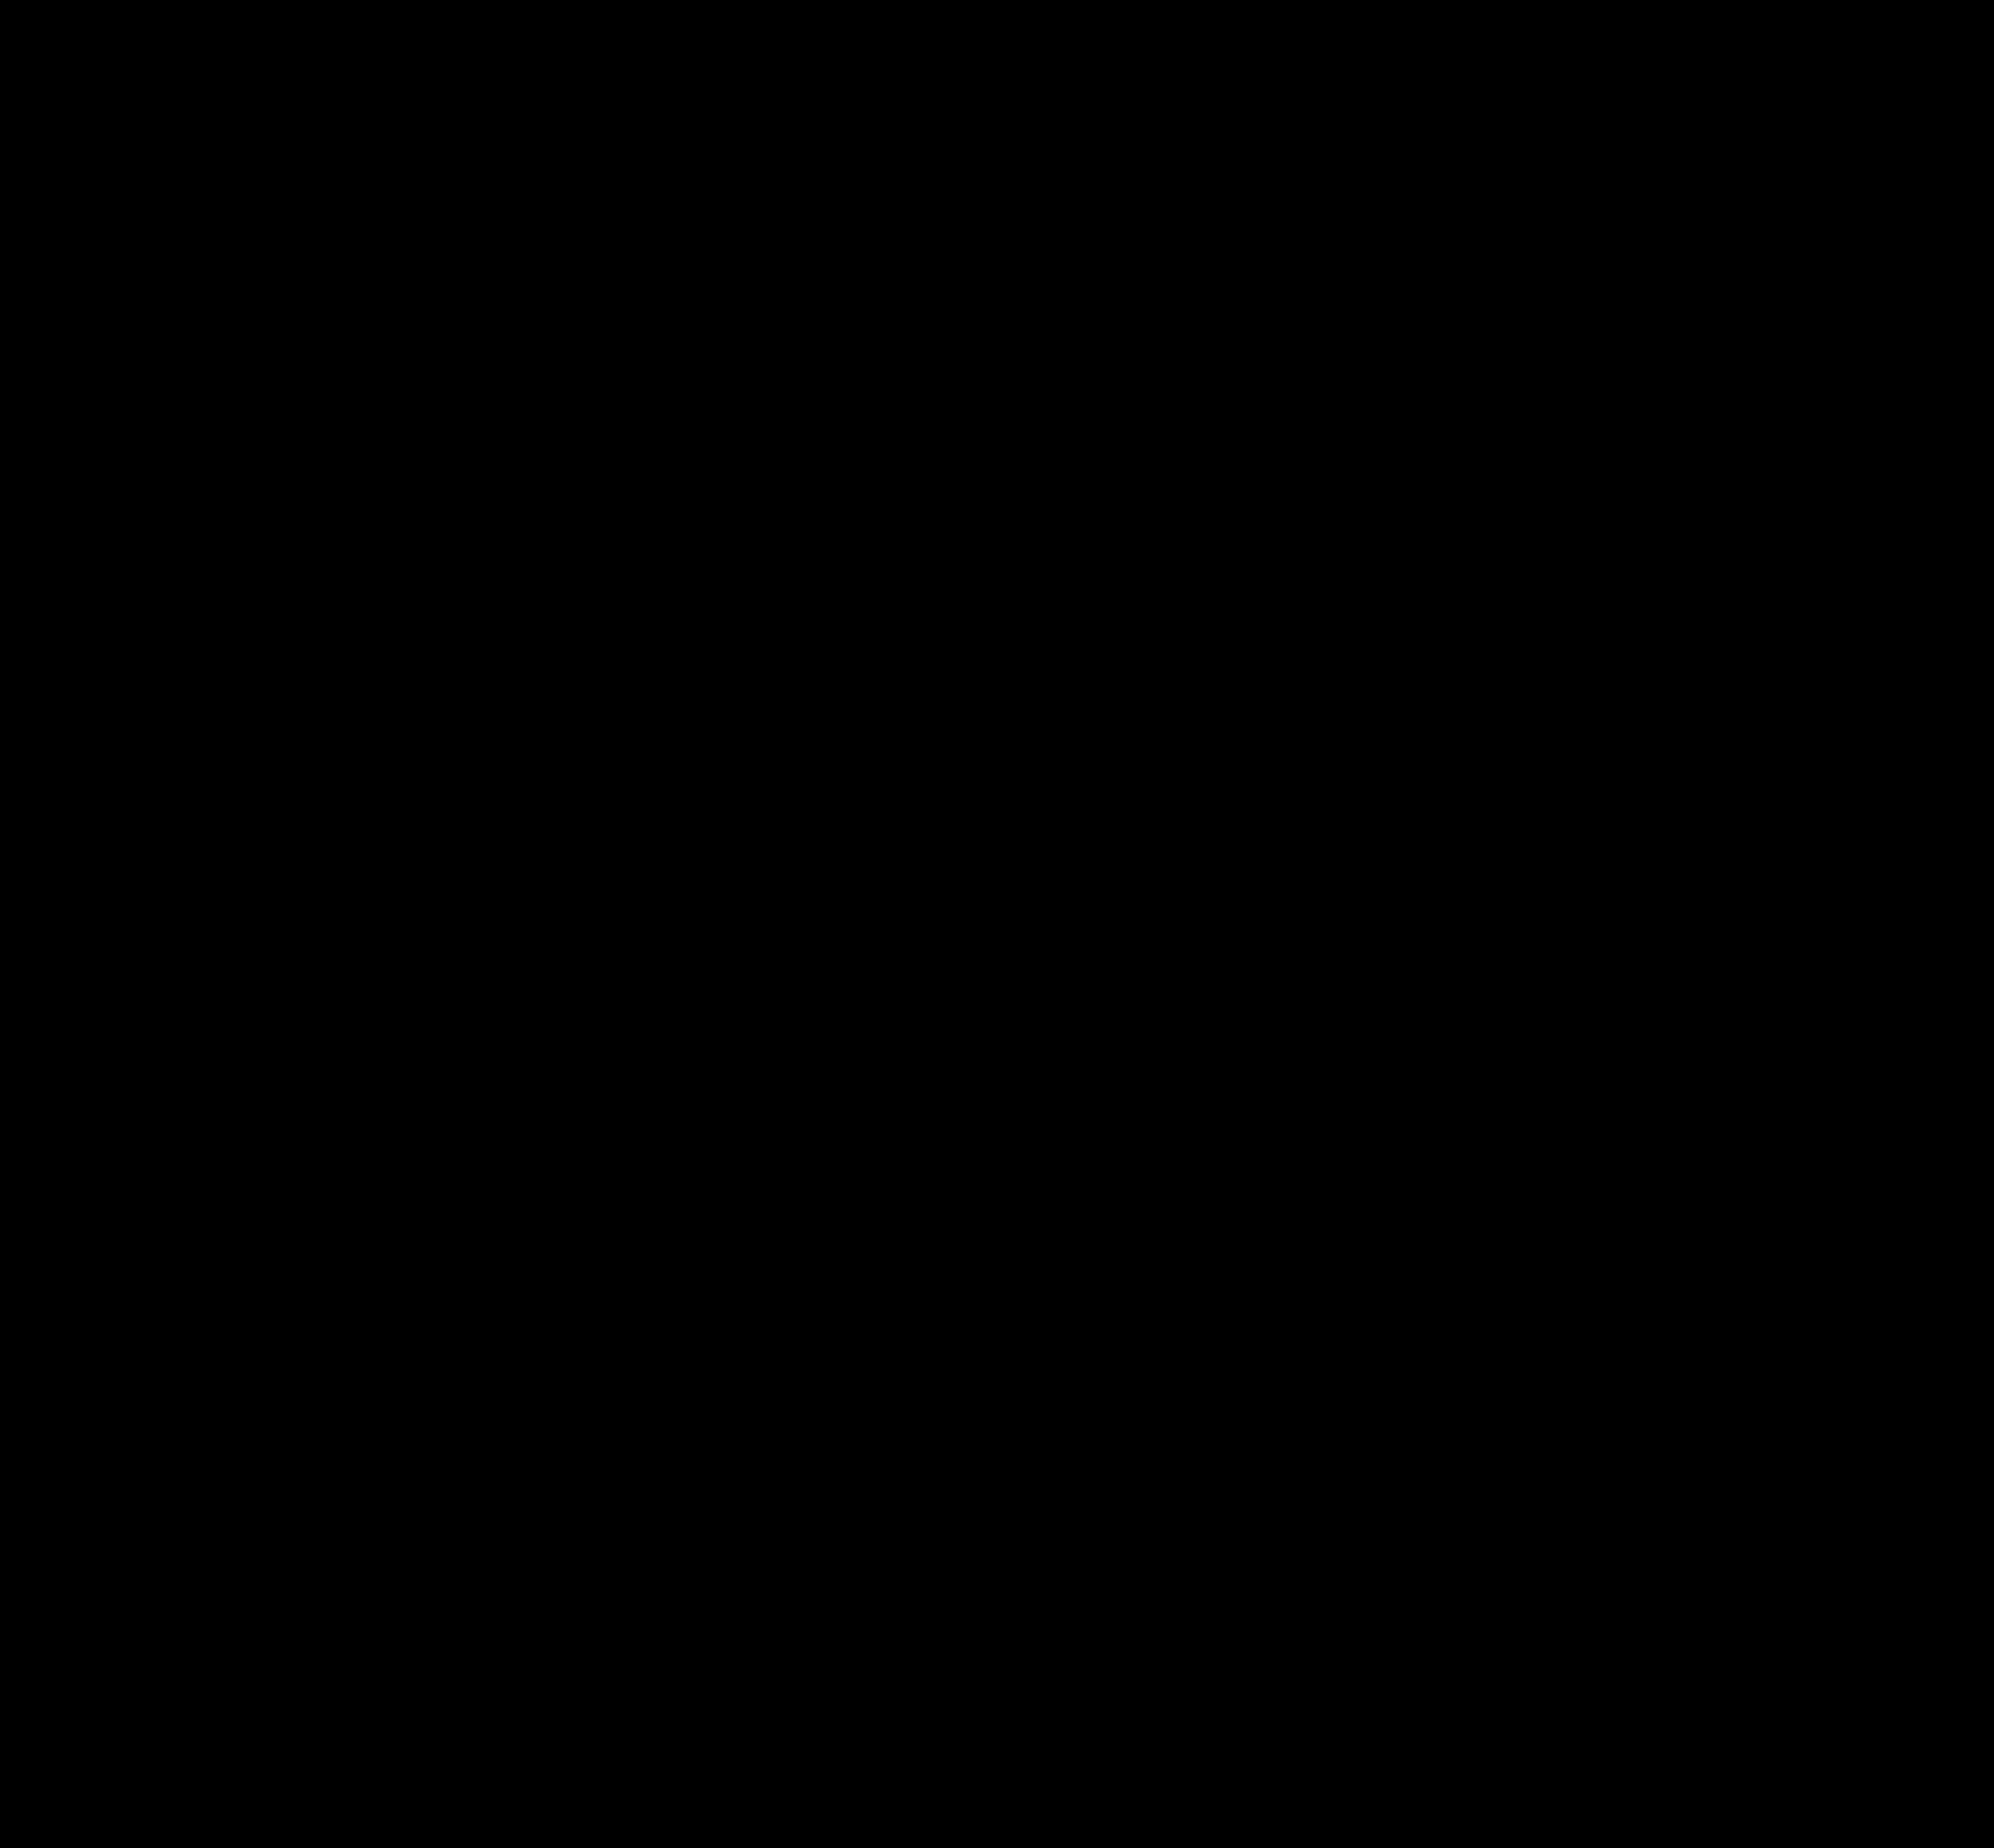 Simple Heart Line Art : Clipart simple heart